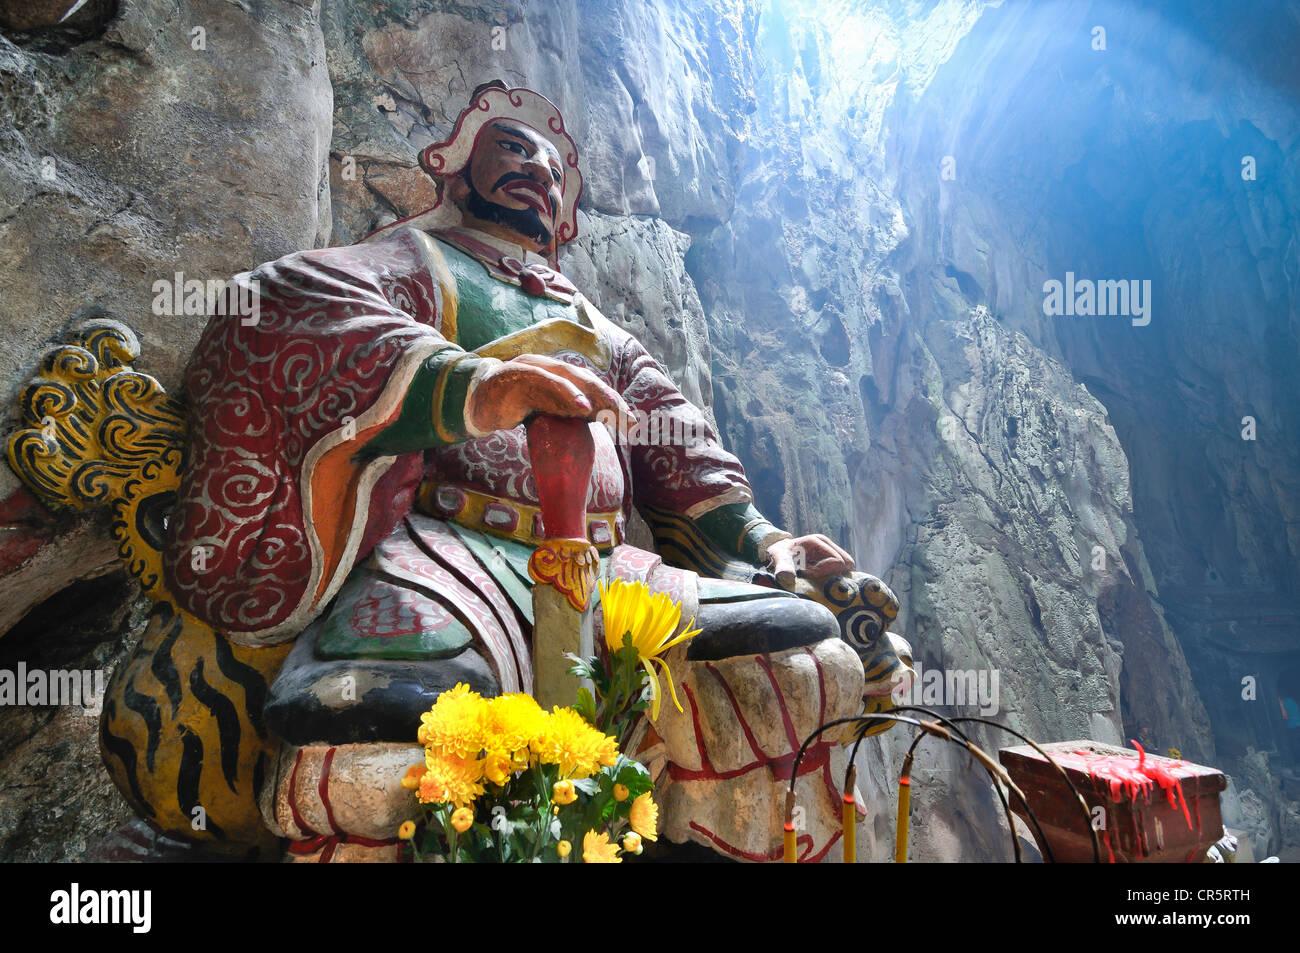 Guardian figure, patron deity, Huyen Khong Grotto, Marble Mountains, Ngu Hanh Son, Thuy Son, Da Nang, Vietnam, Asia - Stock Image